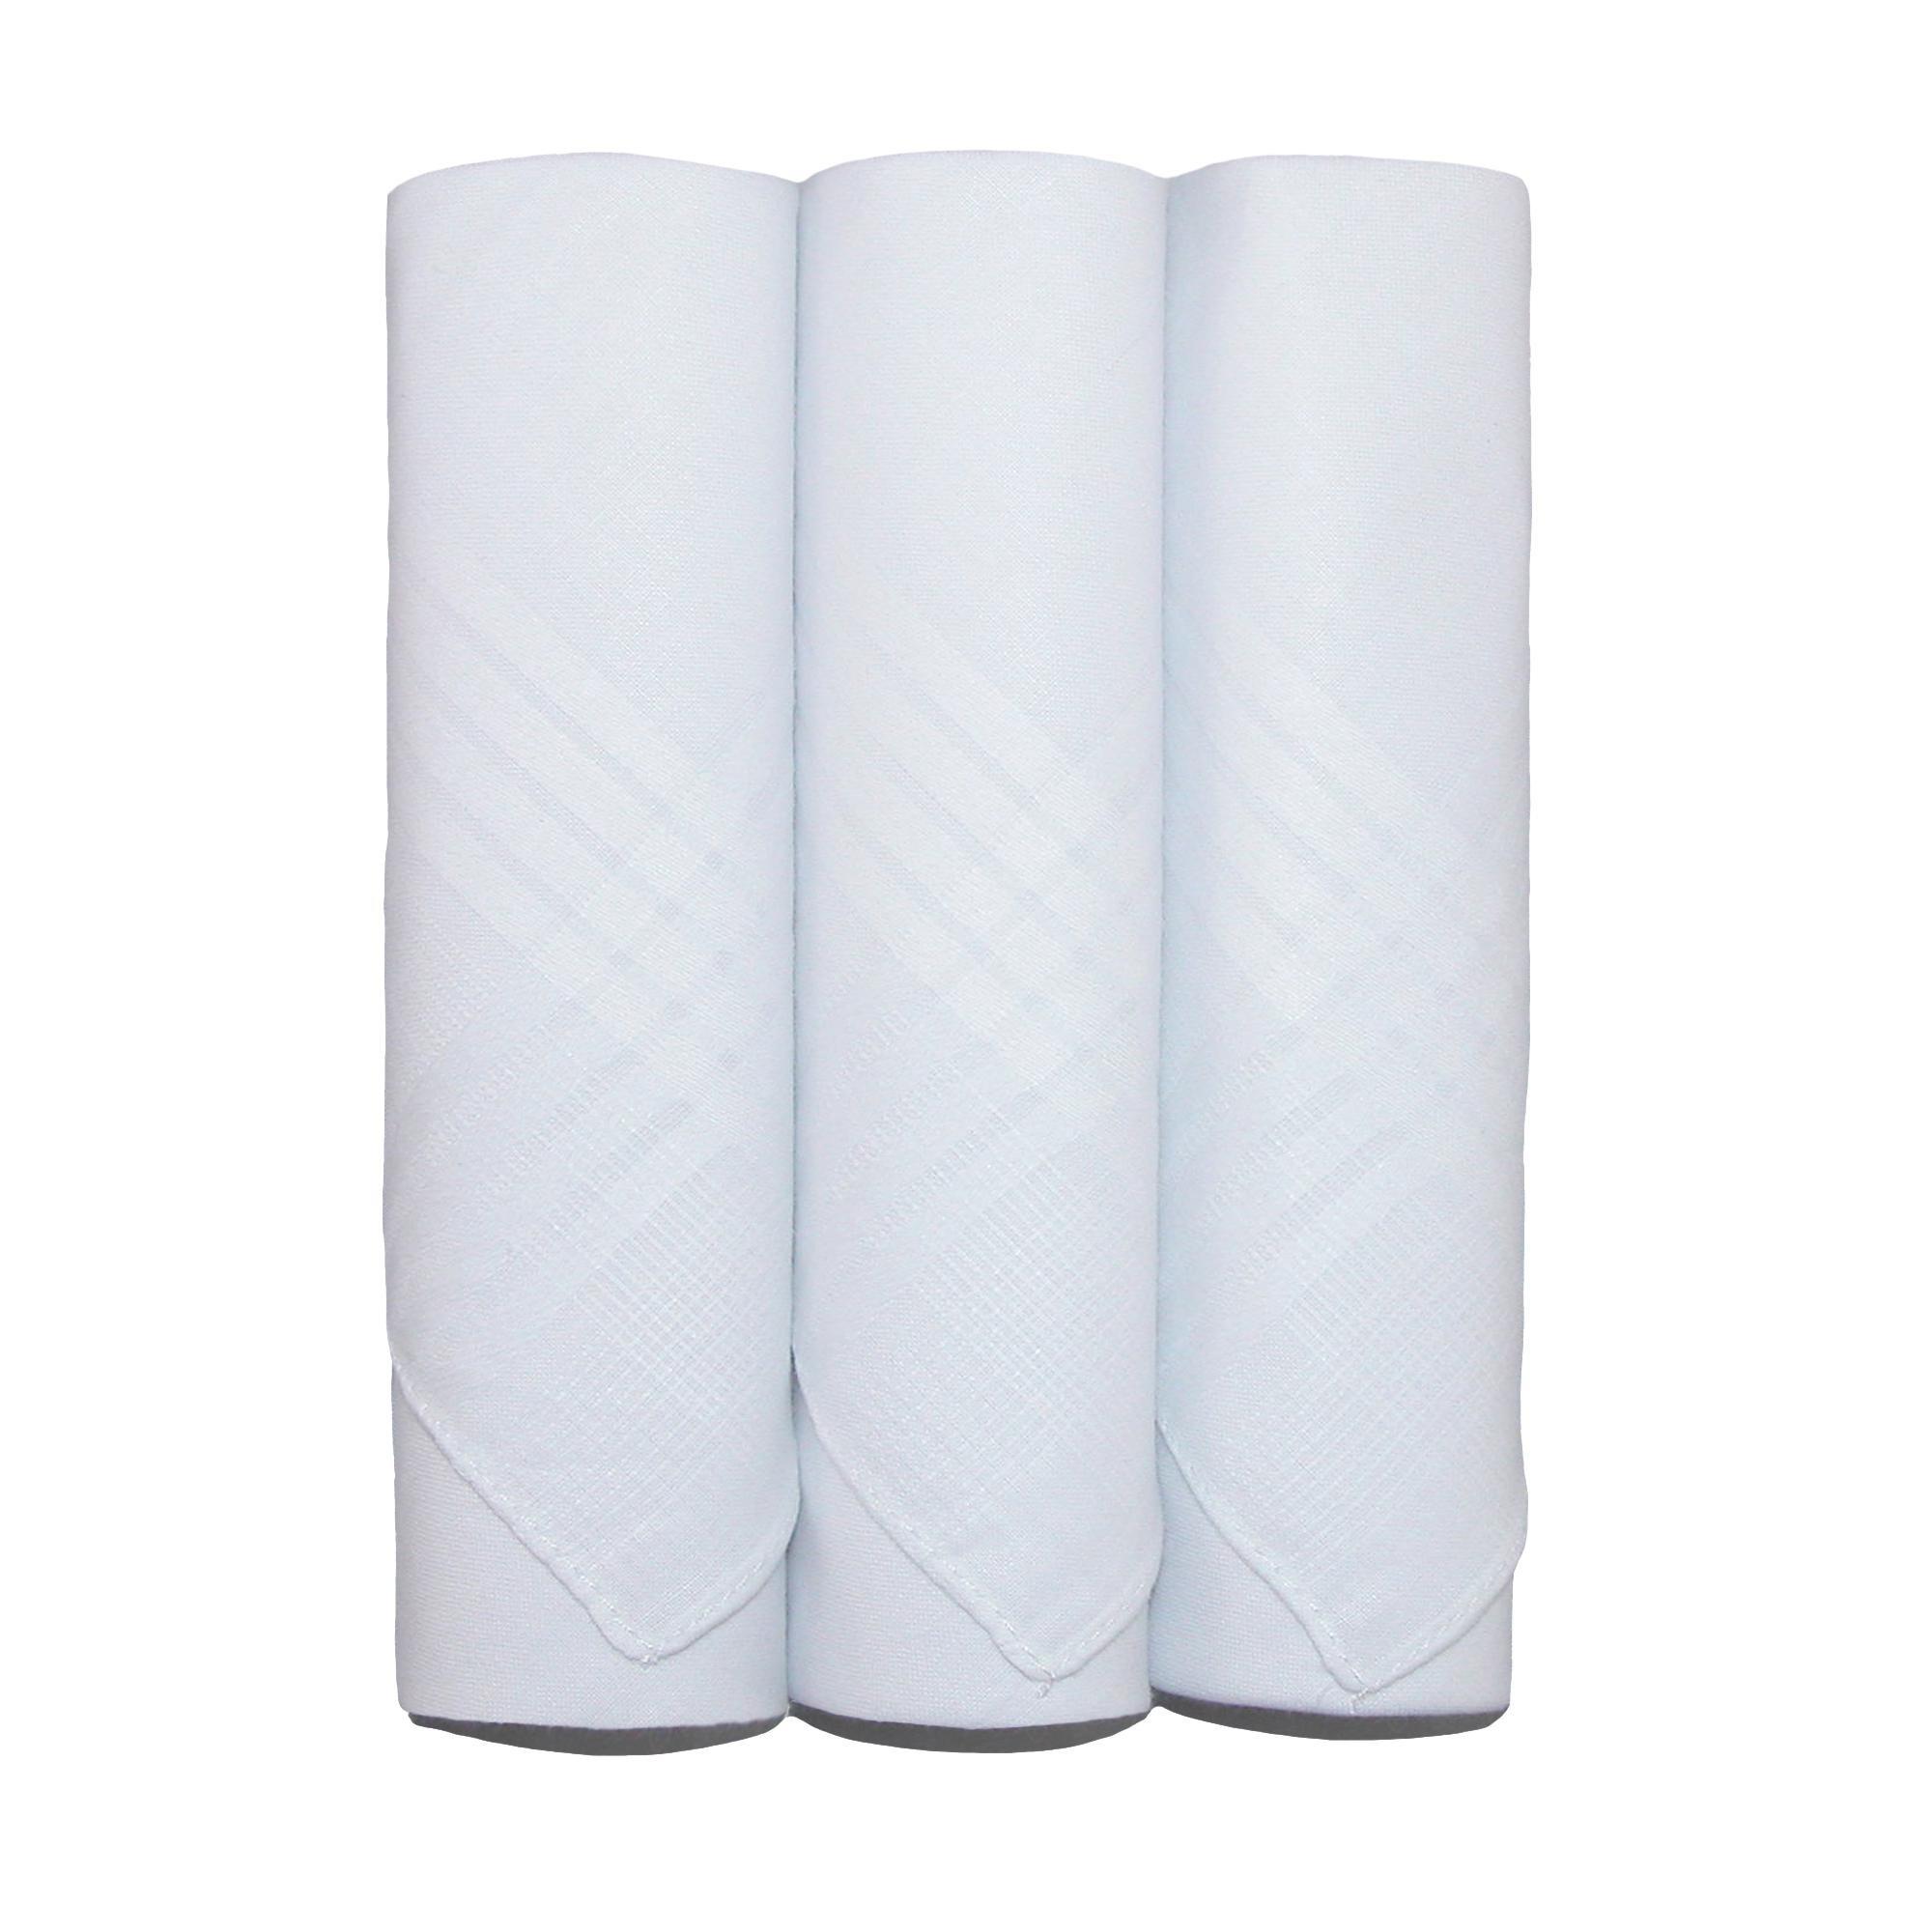 Umo Lorenzo Men's Cotton Boxed Plain Handkerchiefs (Pack of 3), White